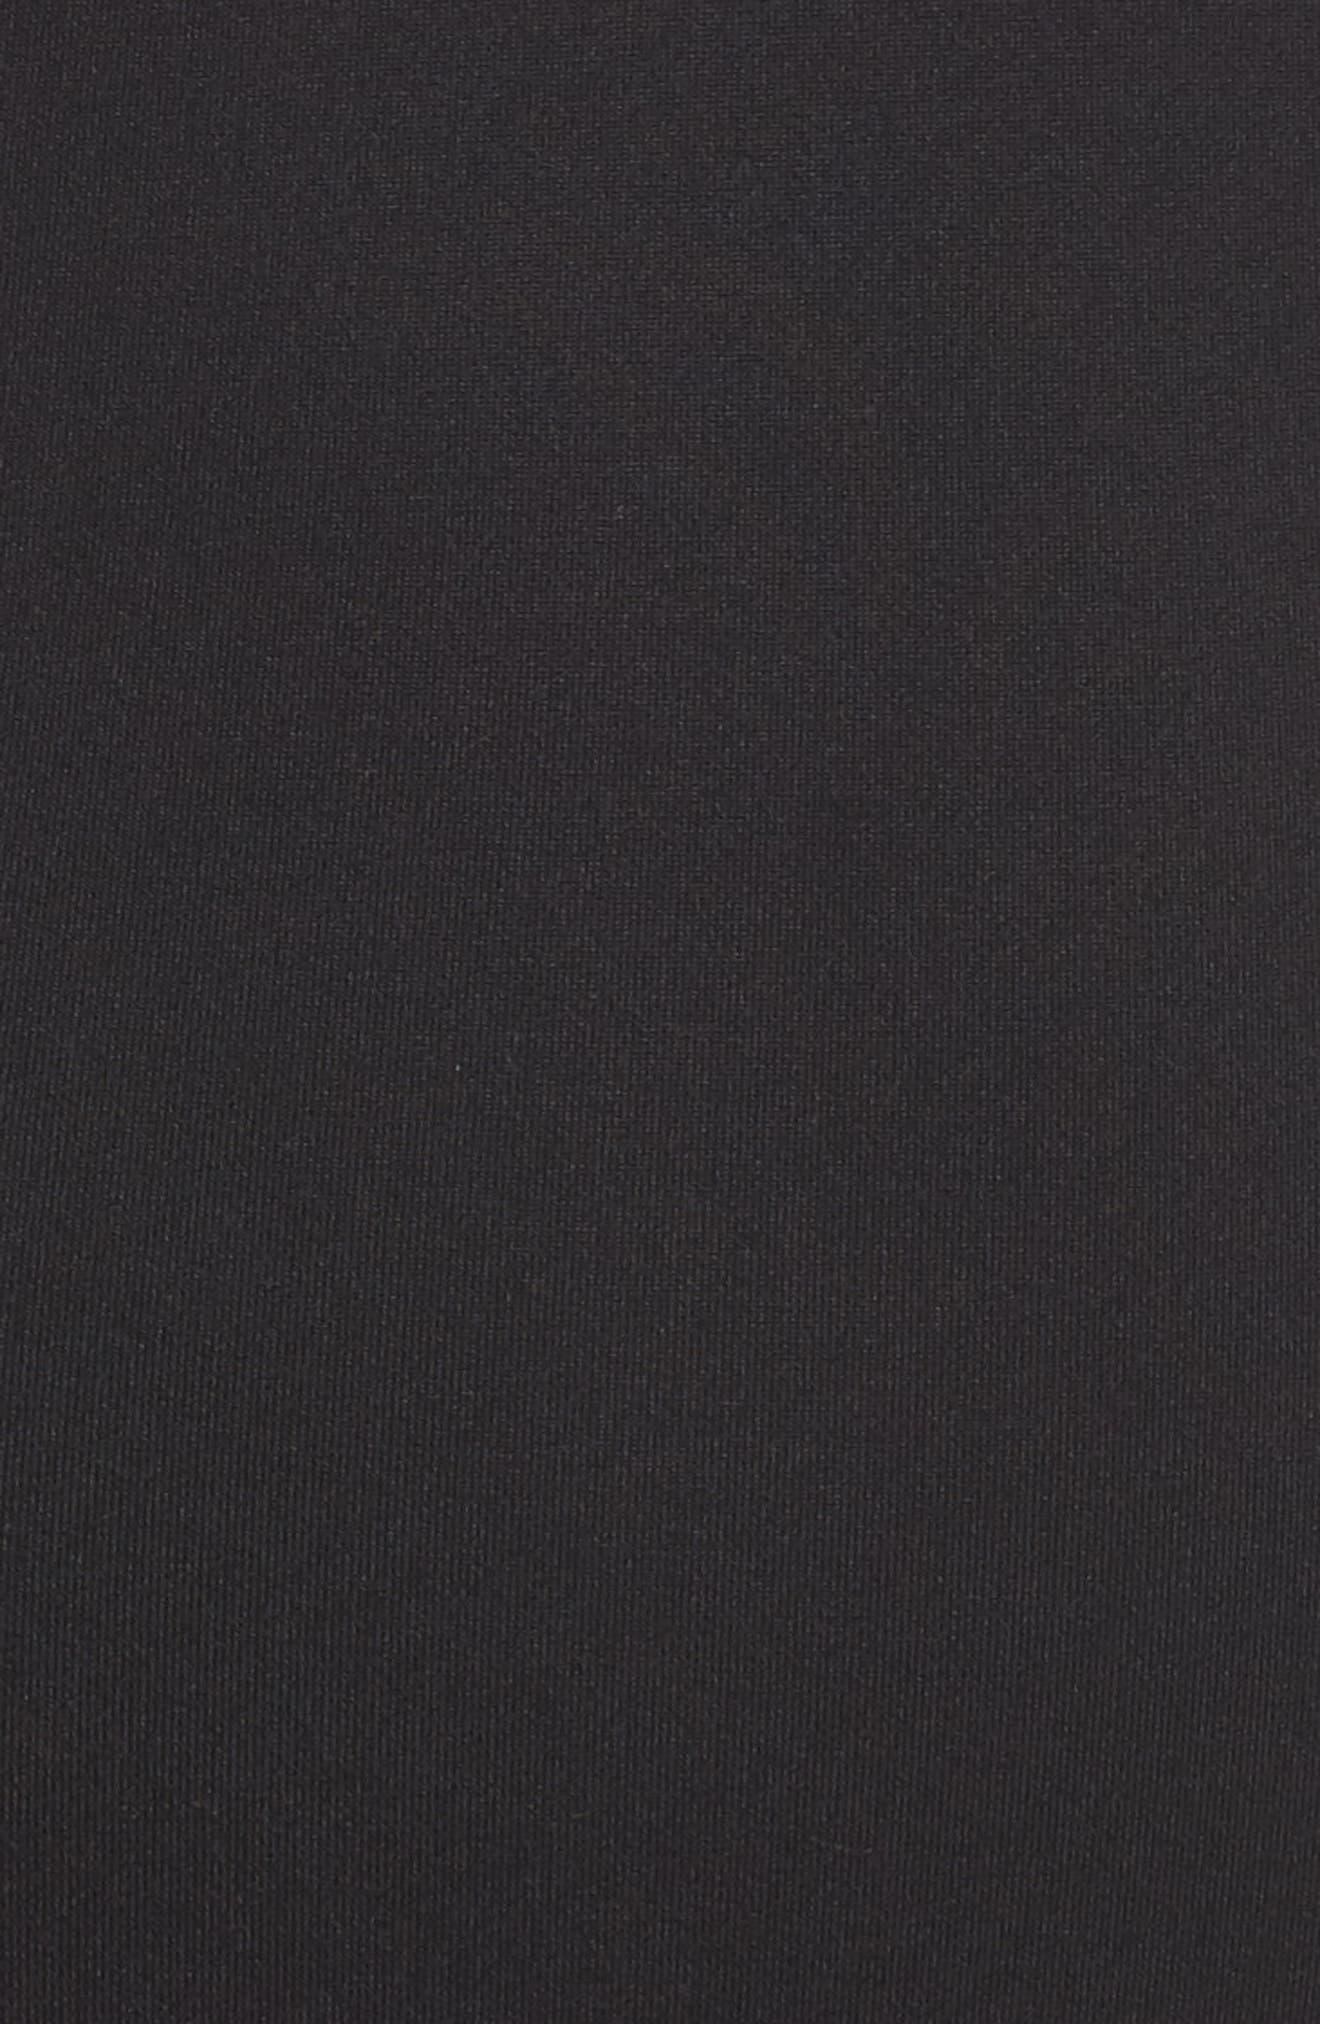 Lighten Up Crop Bodysuit,                             Alternate thumbnail 6, color,                             Black